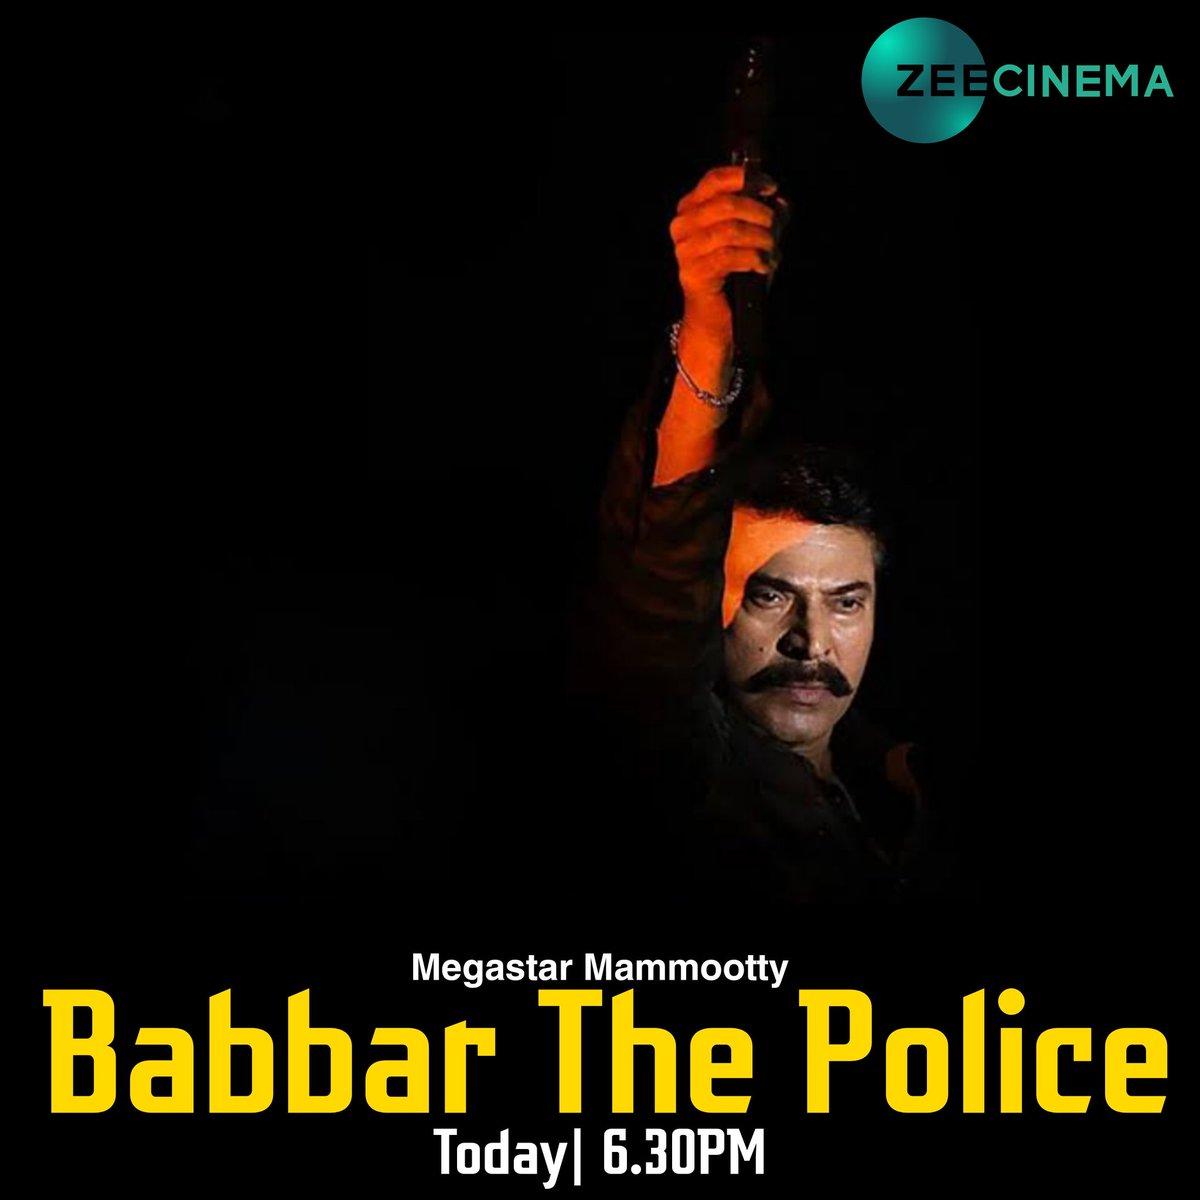 World Television Premiere  #BabbarThePolice ( Abrahaminte Santhathikal ) on #ZeeCinema Today at 6.30pm...  Megastar #Mammootty  #Mammukka  #AnsonPaul #Kaniha @mammukka  #OneTheMovie #ThePriest #BabbarThePoliceOnZeeCinema #ThePriestTeaser